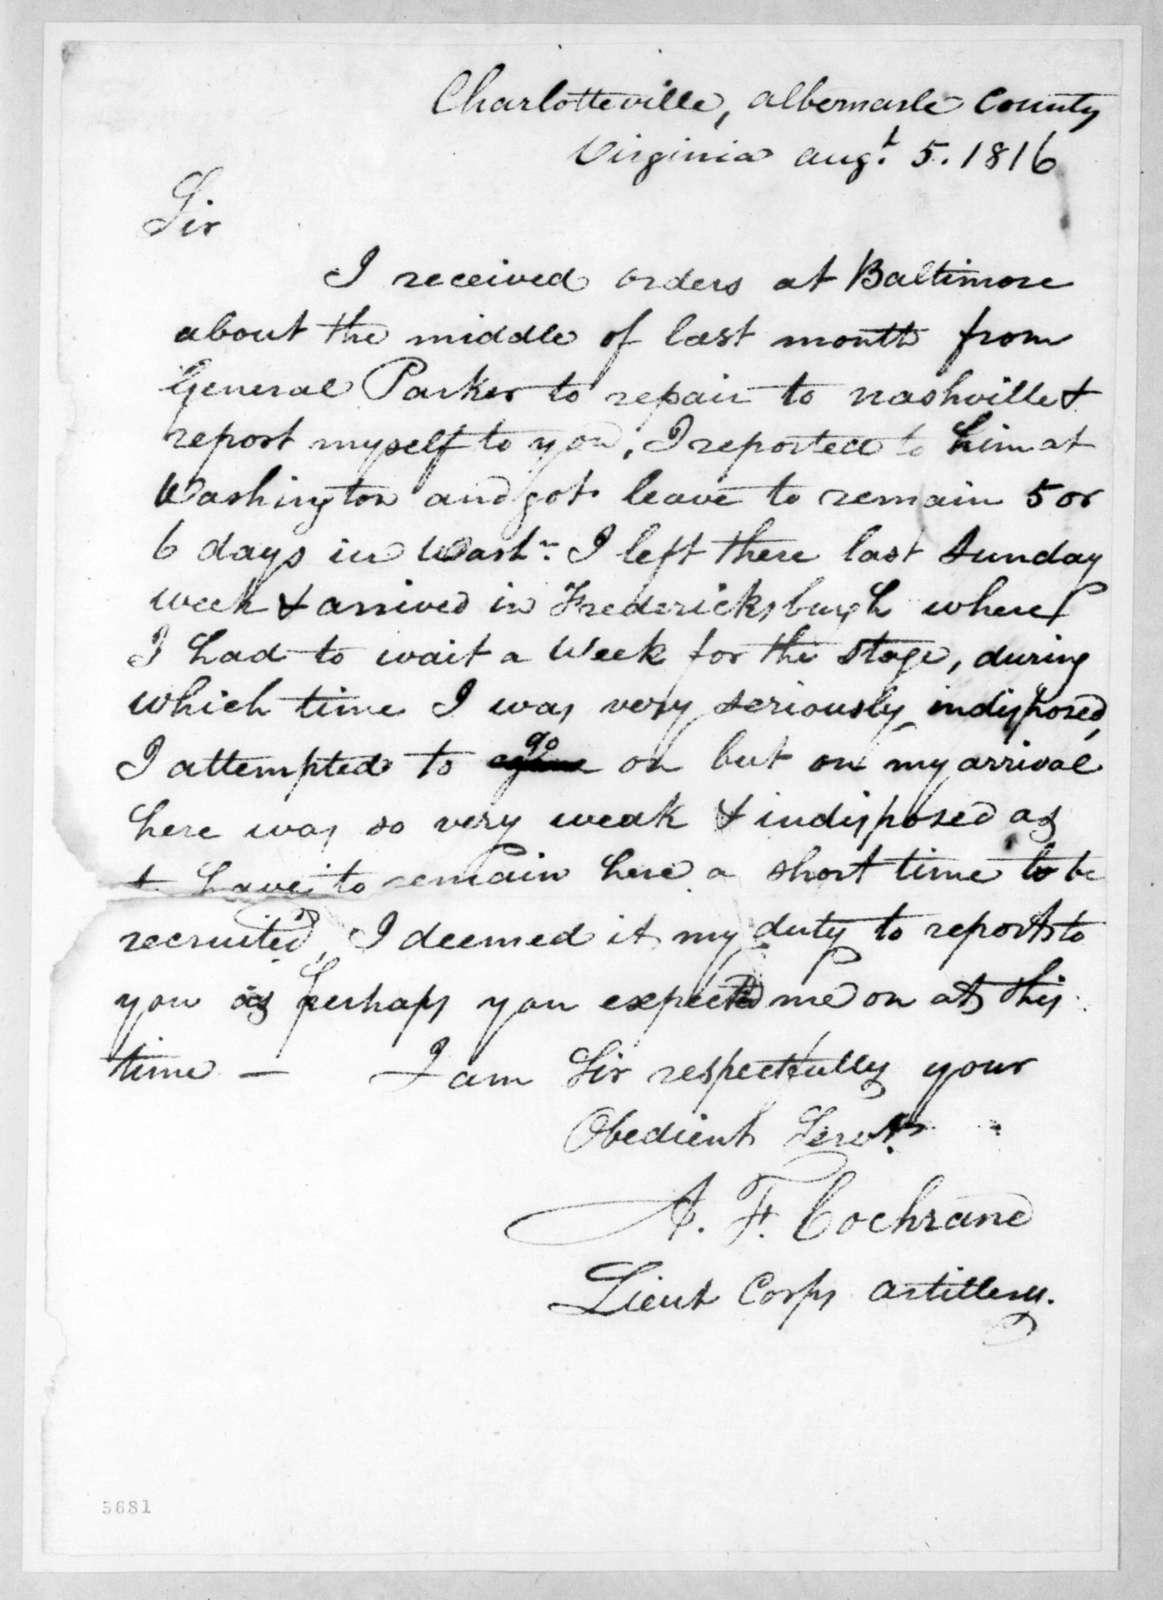 Alexander Fulton Cochrane to Andrew Jackson, August 5, 1816